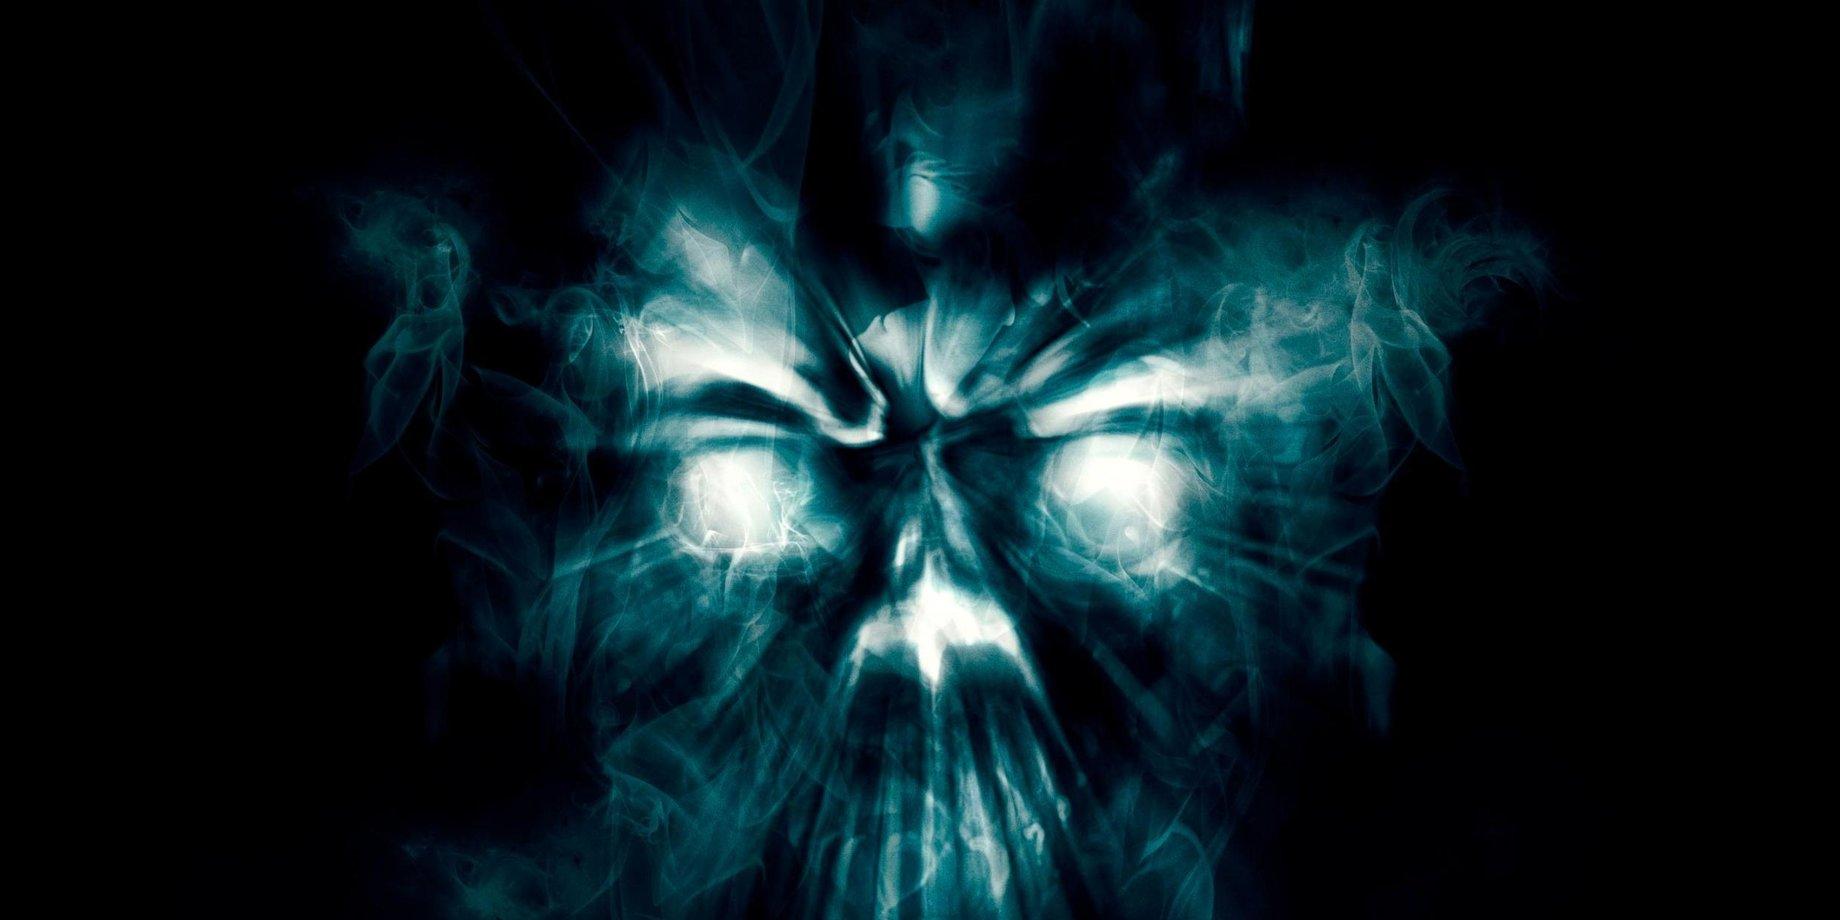 Horror Movies Wallpaper S Darko Wallpaper 1  Fanpop